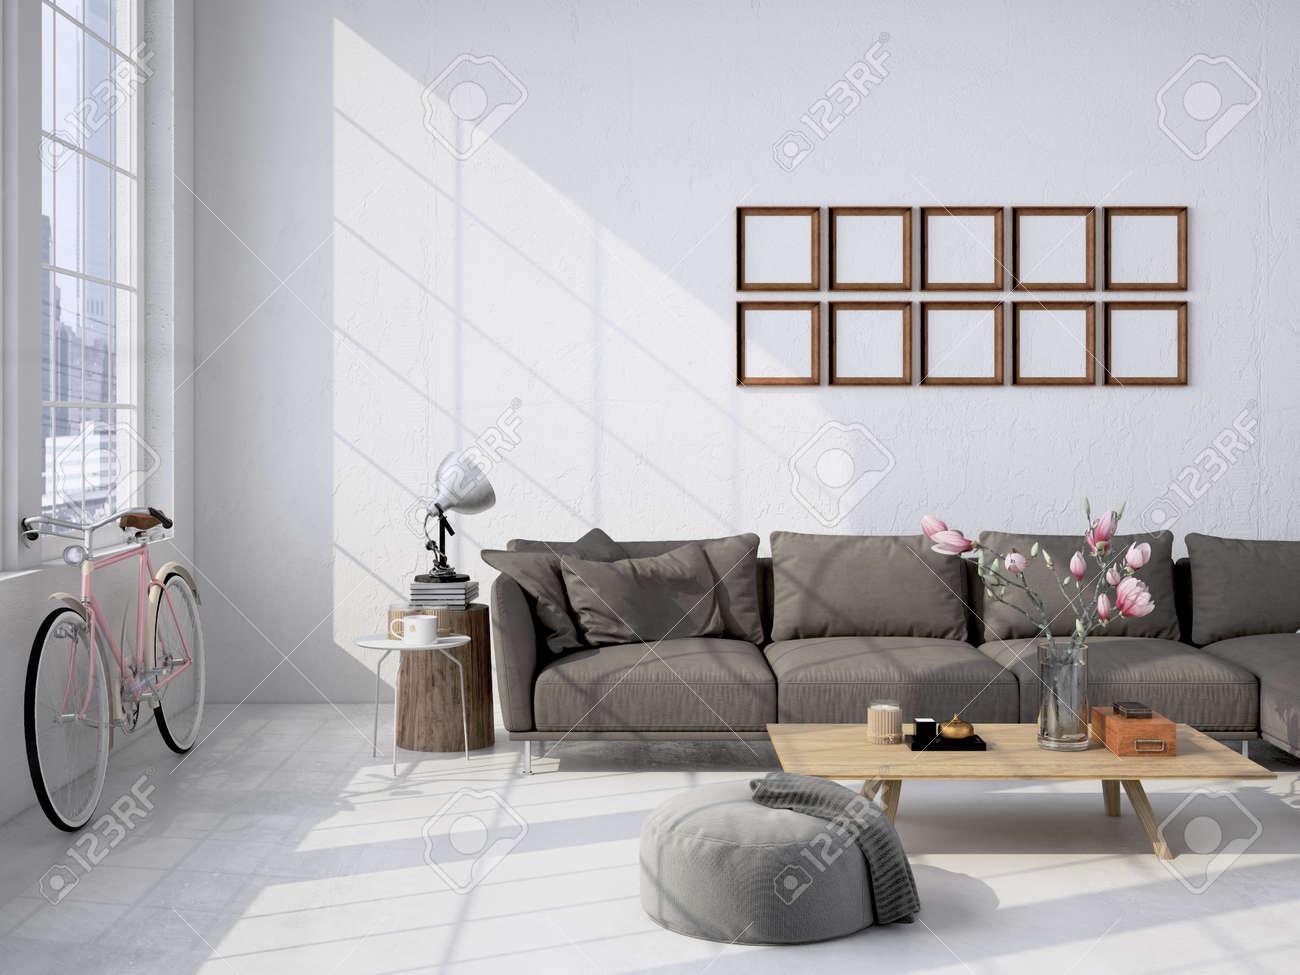 Contemporary Living Room Loft Interior. 3d Rendering Stock Photo ...